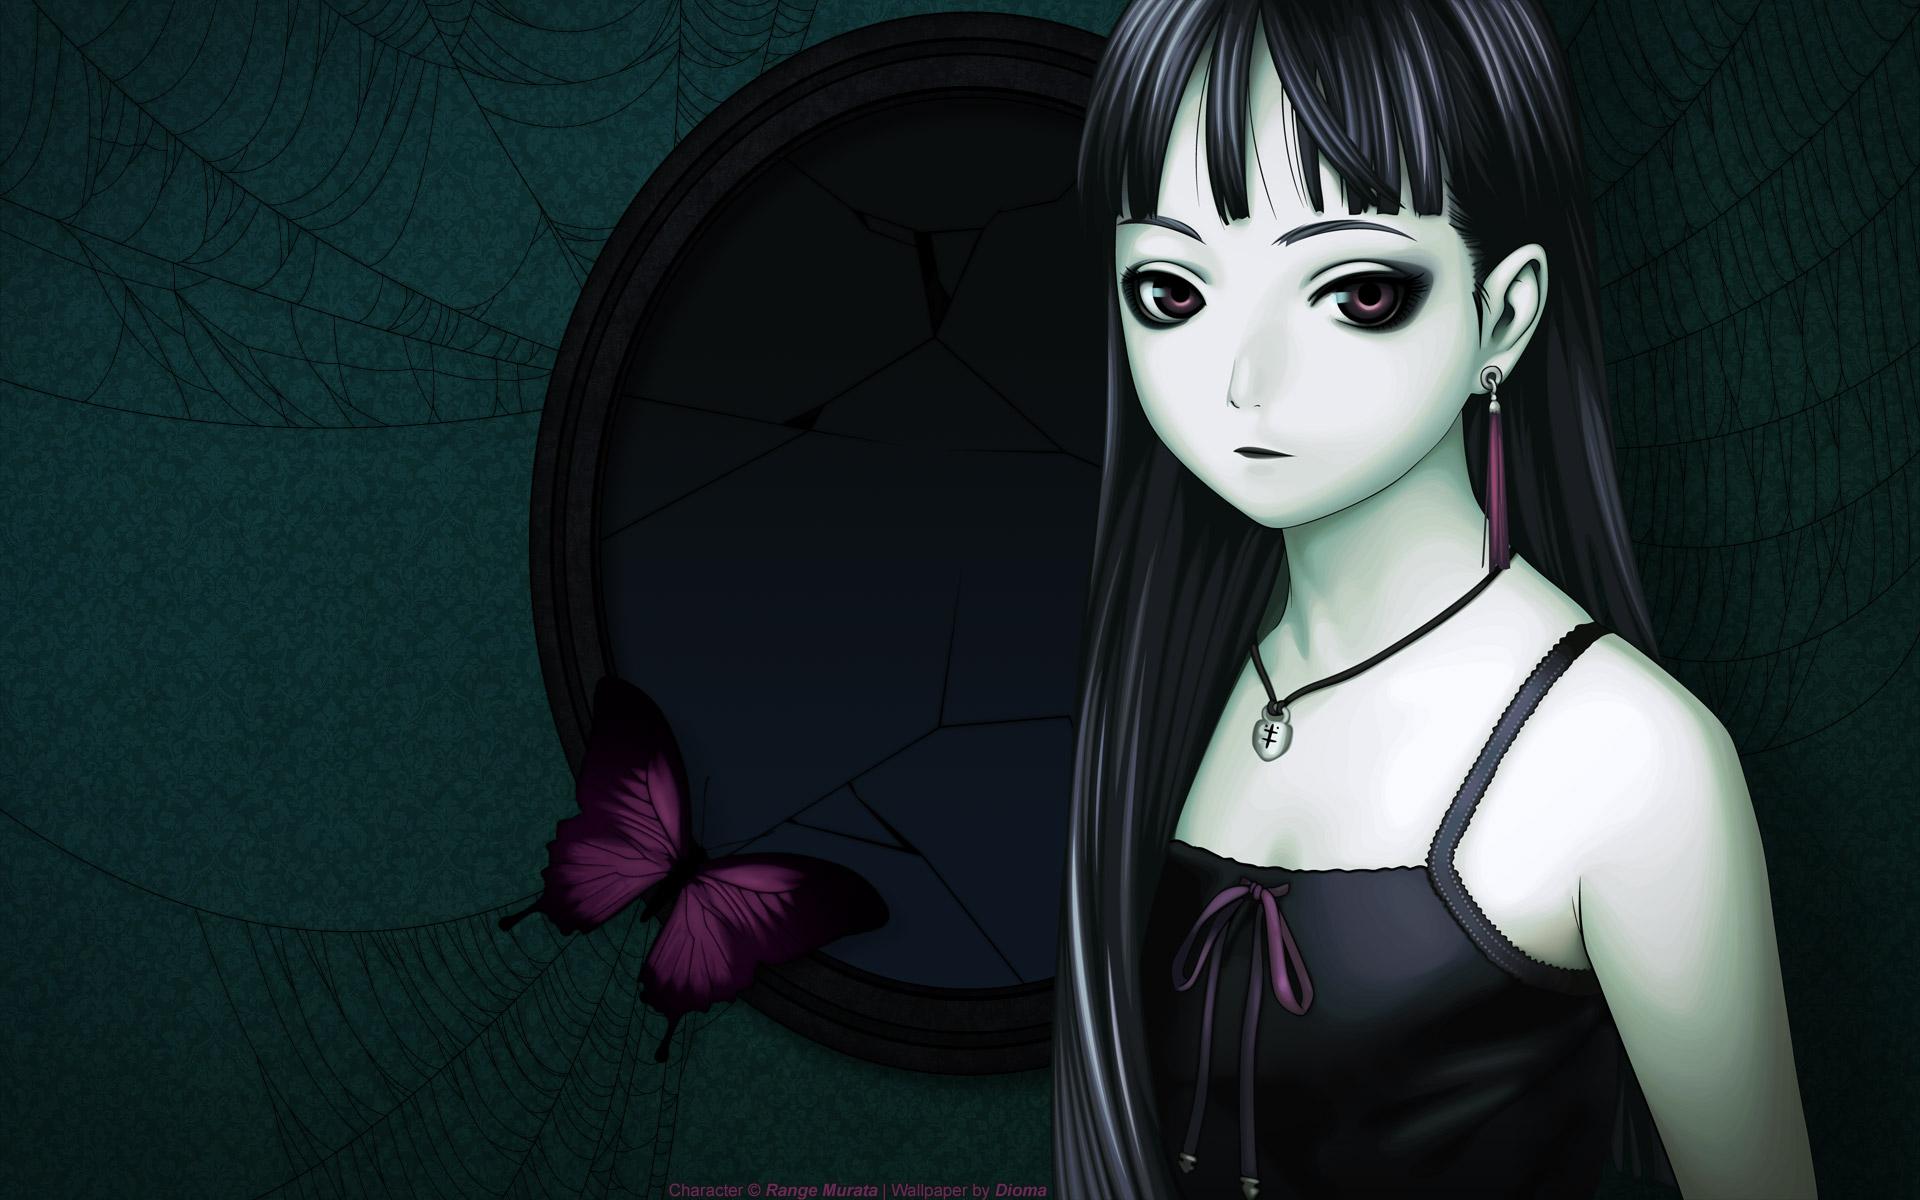 Anime Goth Girl Desktop Wallpaper Download Anime Goth Girl Wallpaper 1920x1200